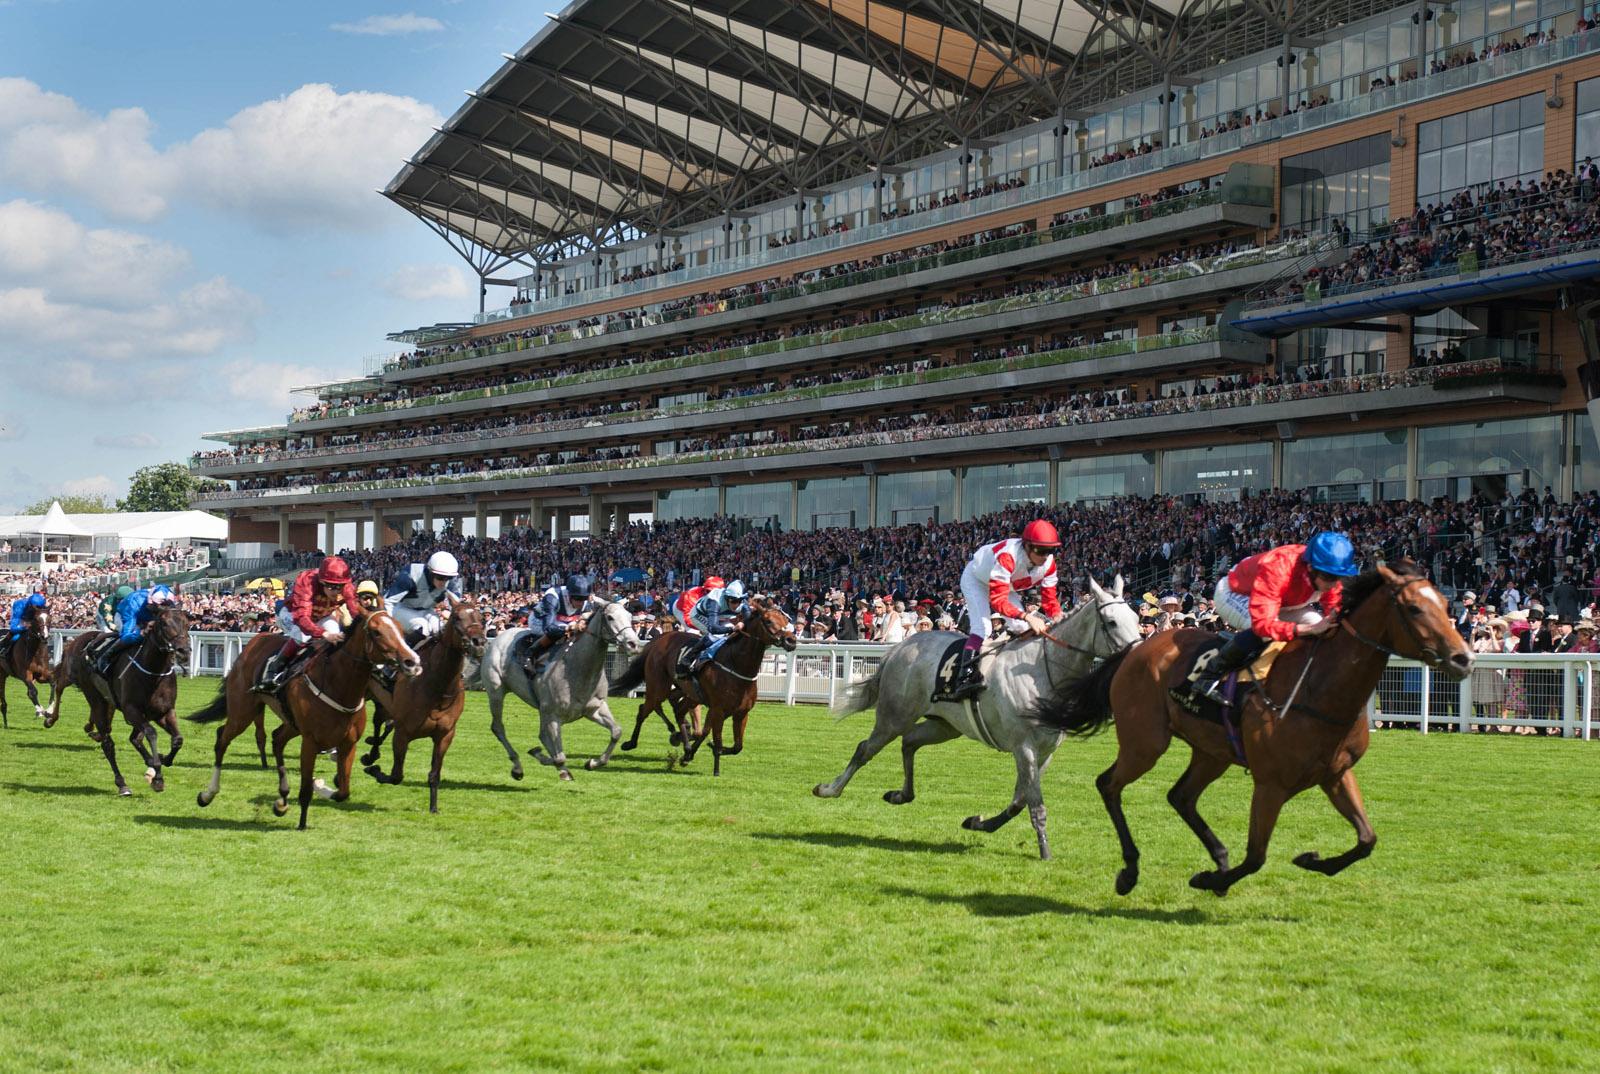 Diamond jubilee stakes 2021 betting free sports bets no deposit 2021